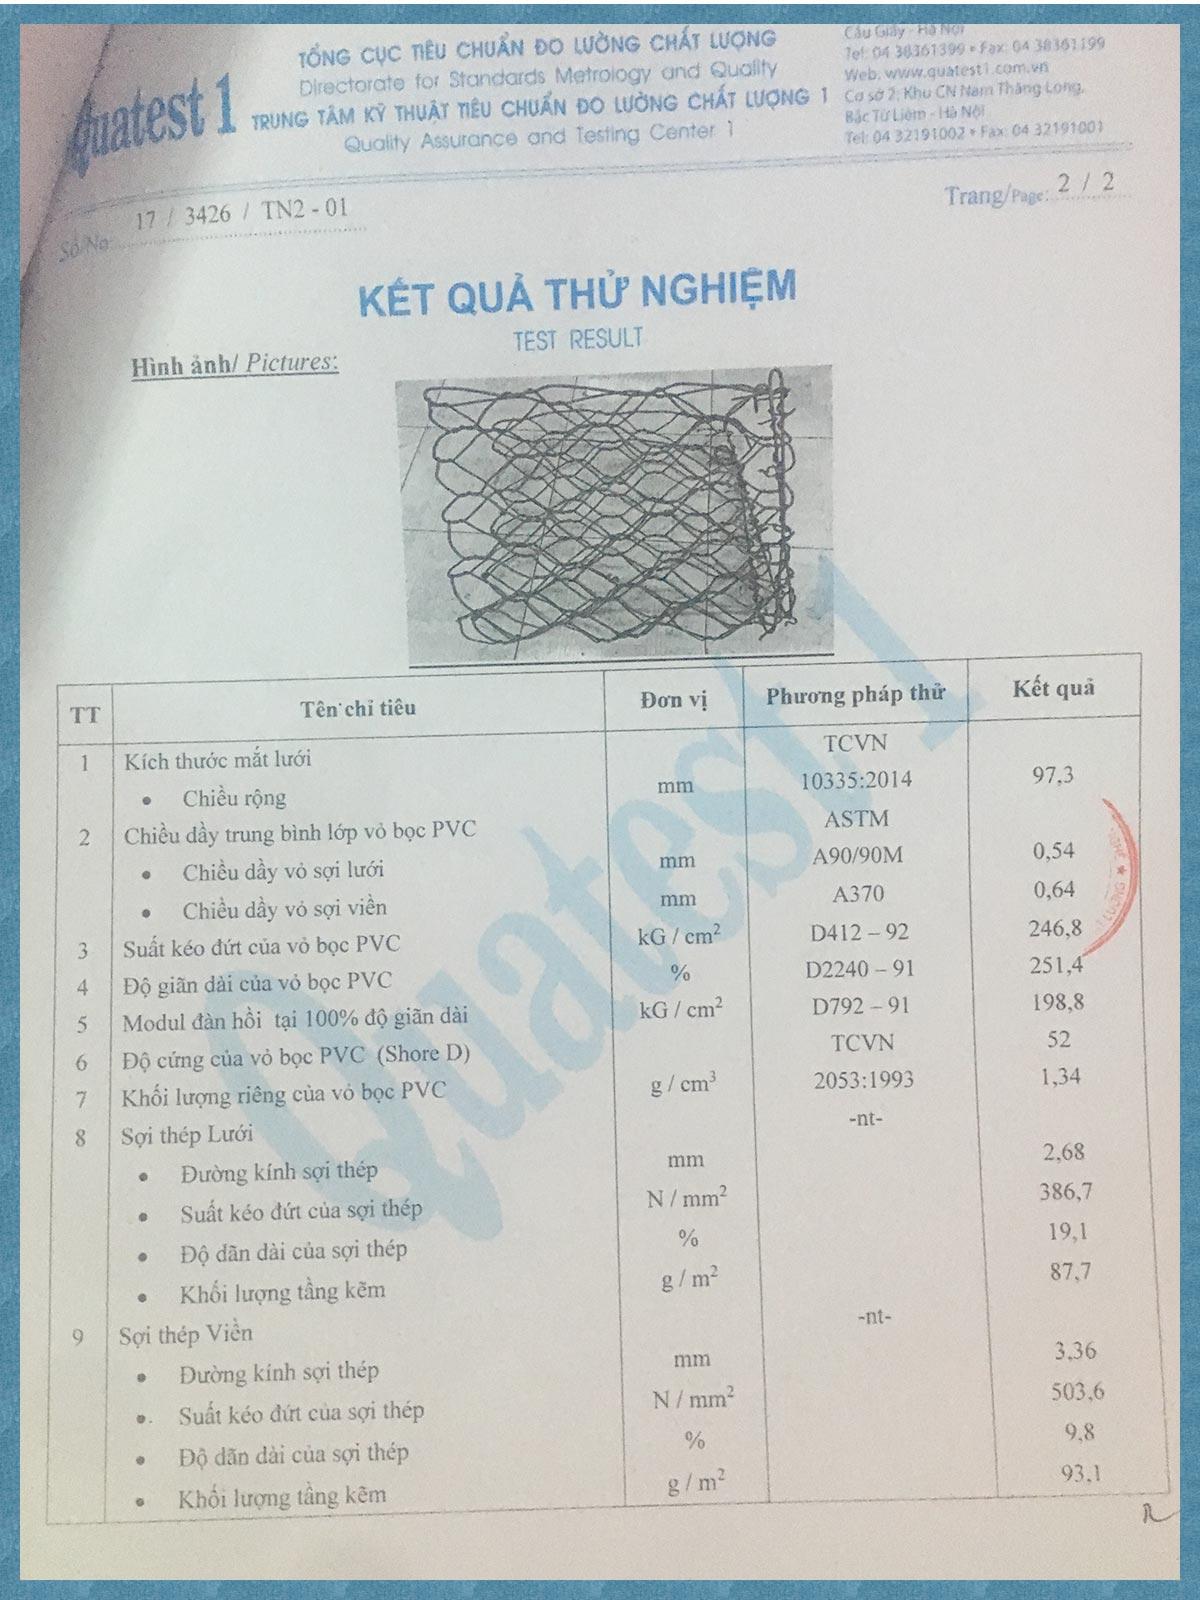 chungchi-ket-qua-thu-nghiem04